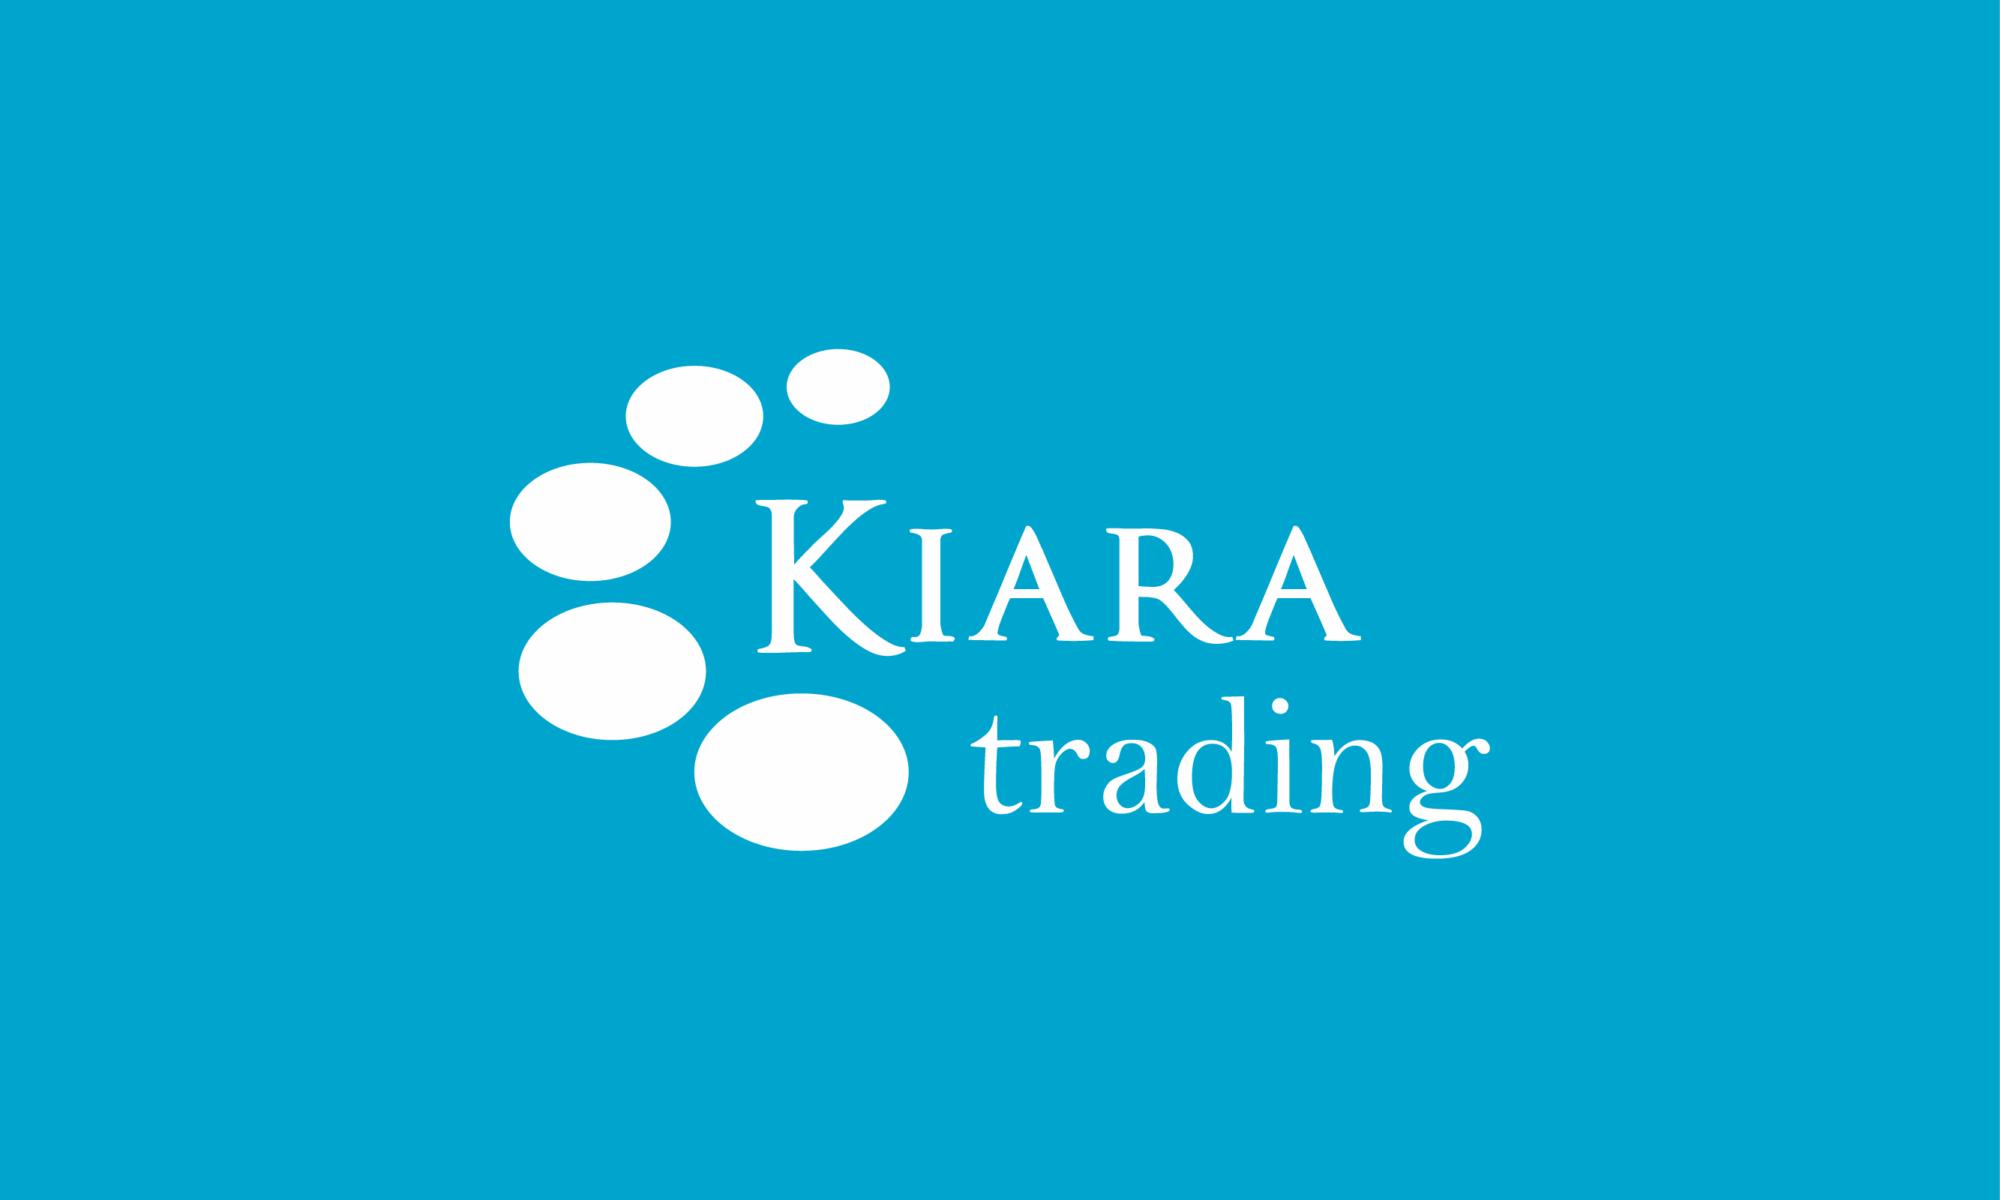 kiara trading